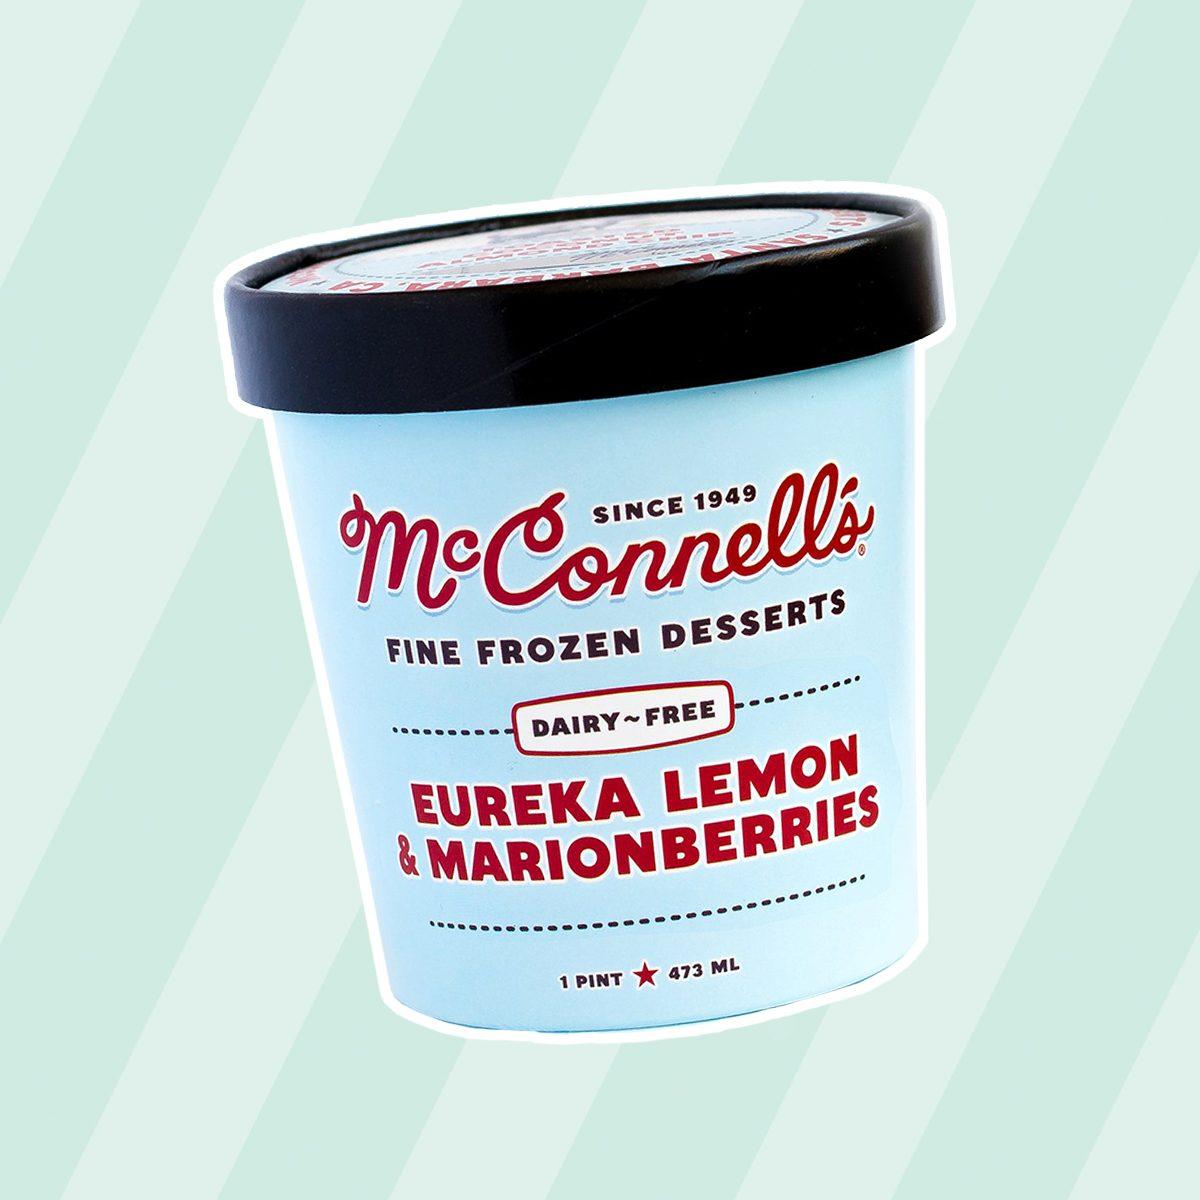 McConnell's Fine Ice Creams DAIRY-FREE EUREKA LEMON & MARIONBERRIES